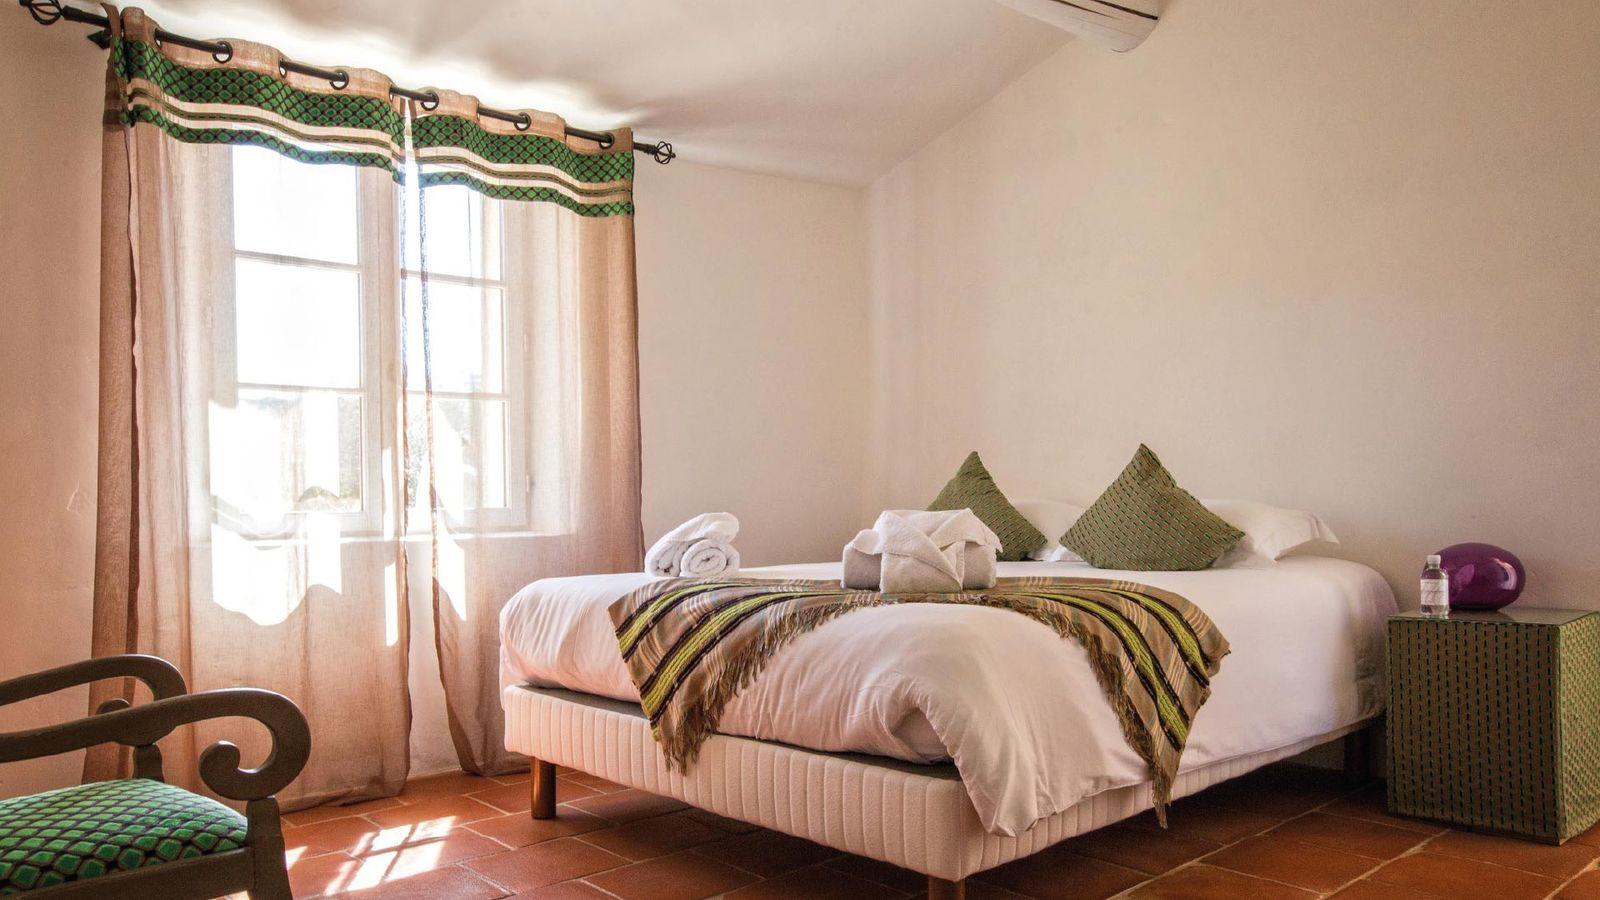 Outstanding villa Rental in Saint Remy de Provence 18